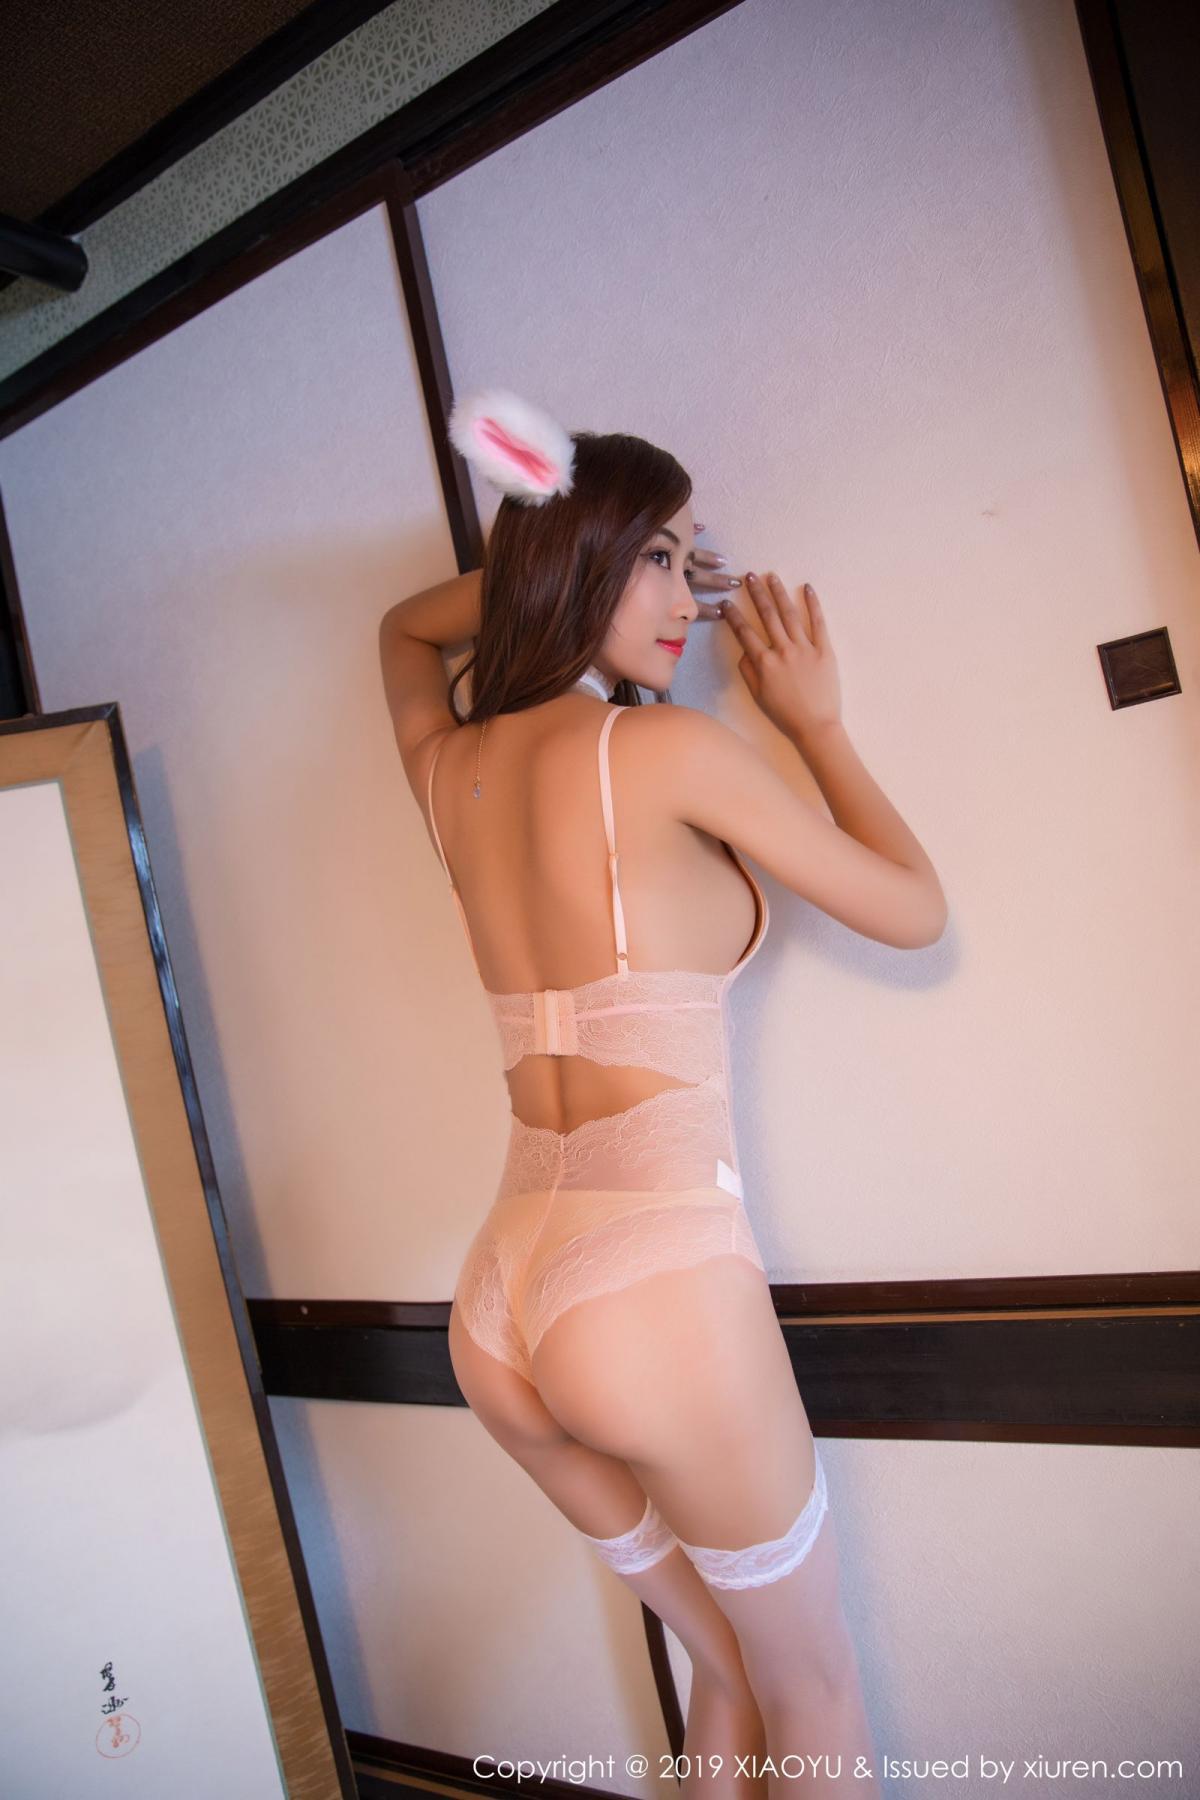 [XiaoYu] Vol.001 Hu Ya Mao Bao 28P, Hu Ya Mao Bao, Tall, Underwear, XiaoYu